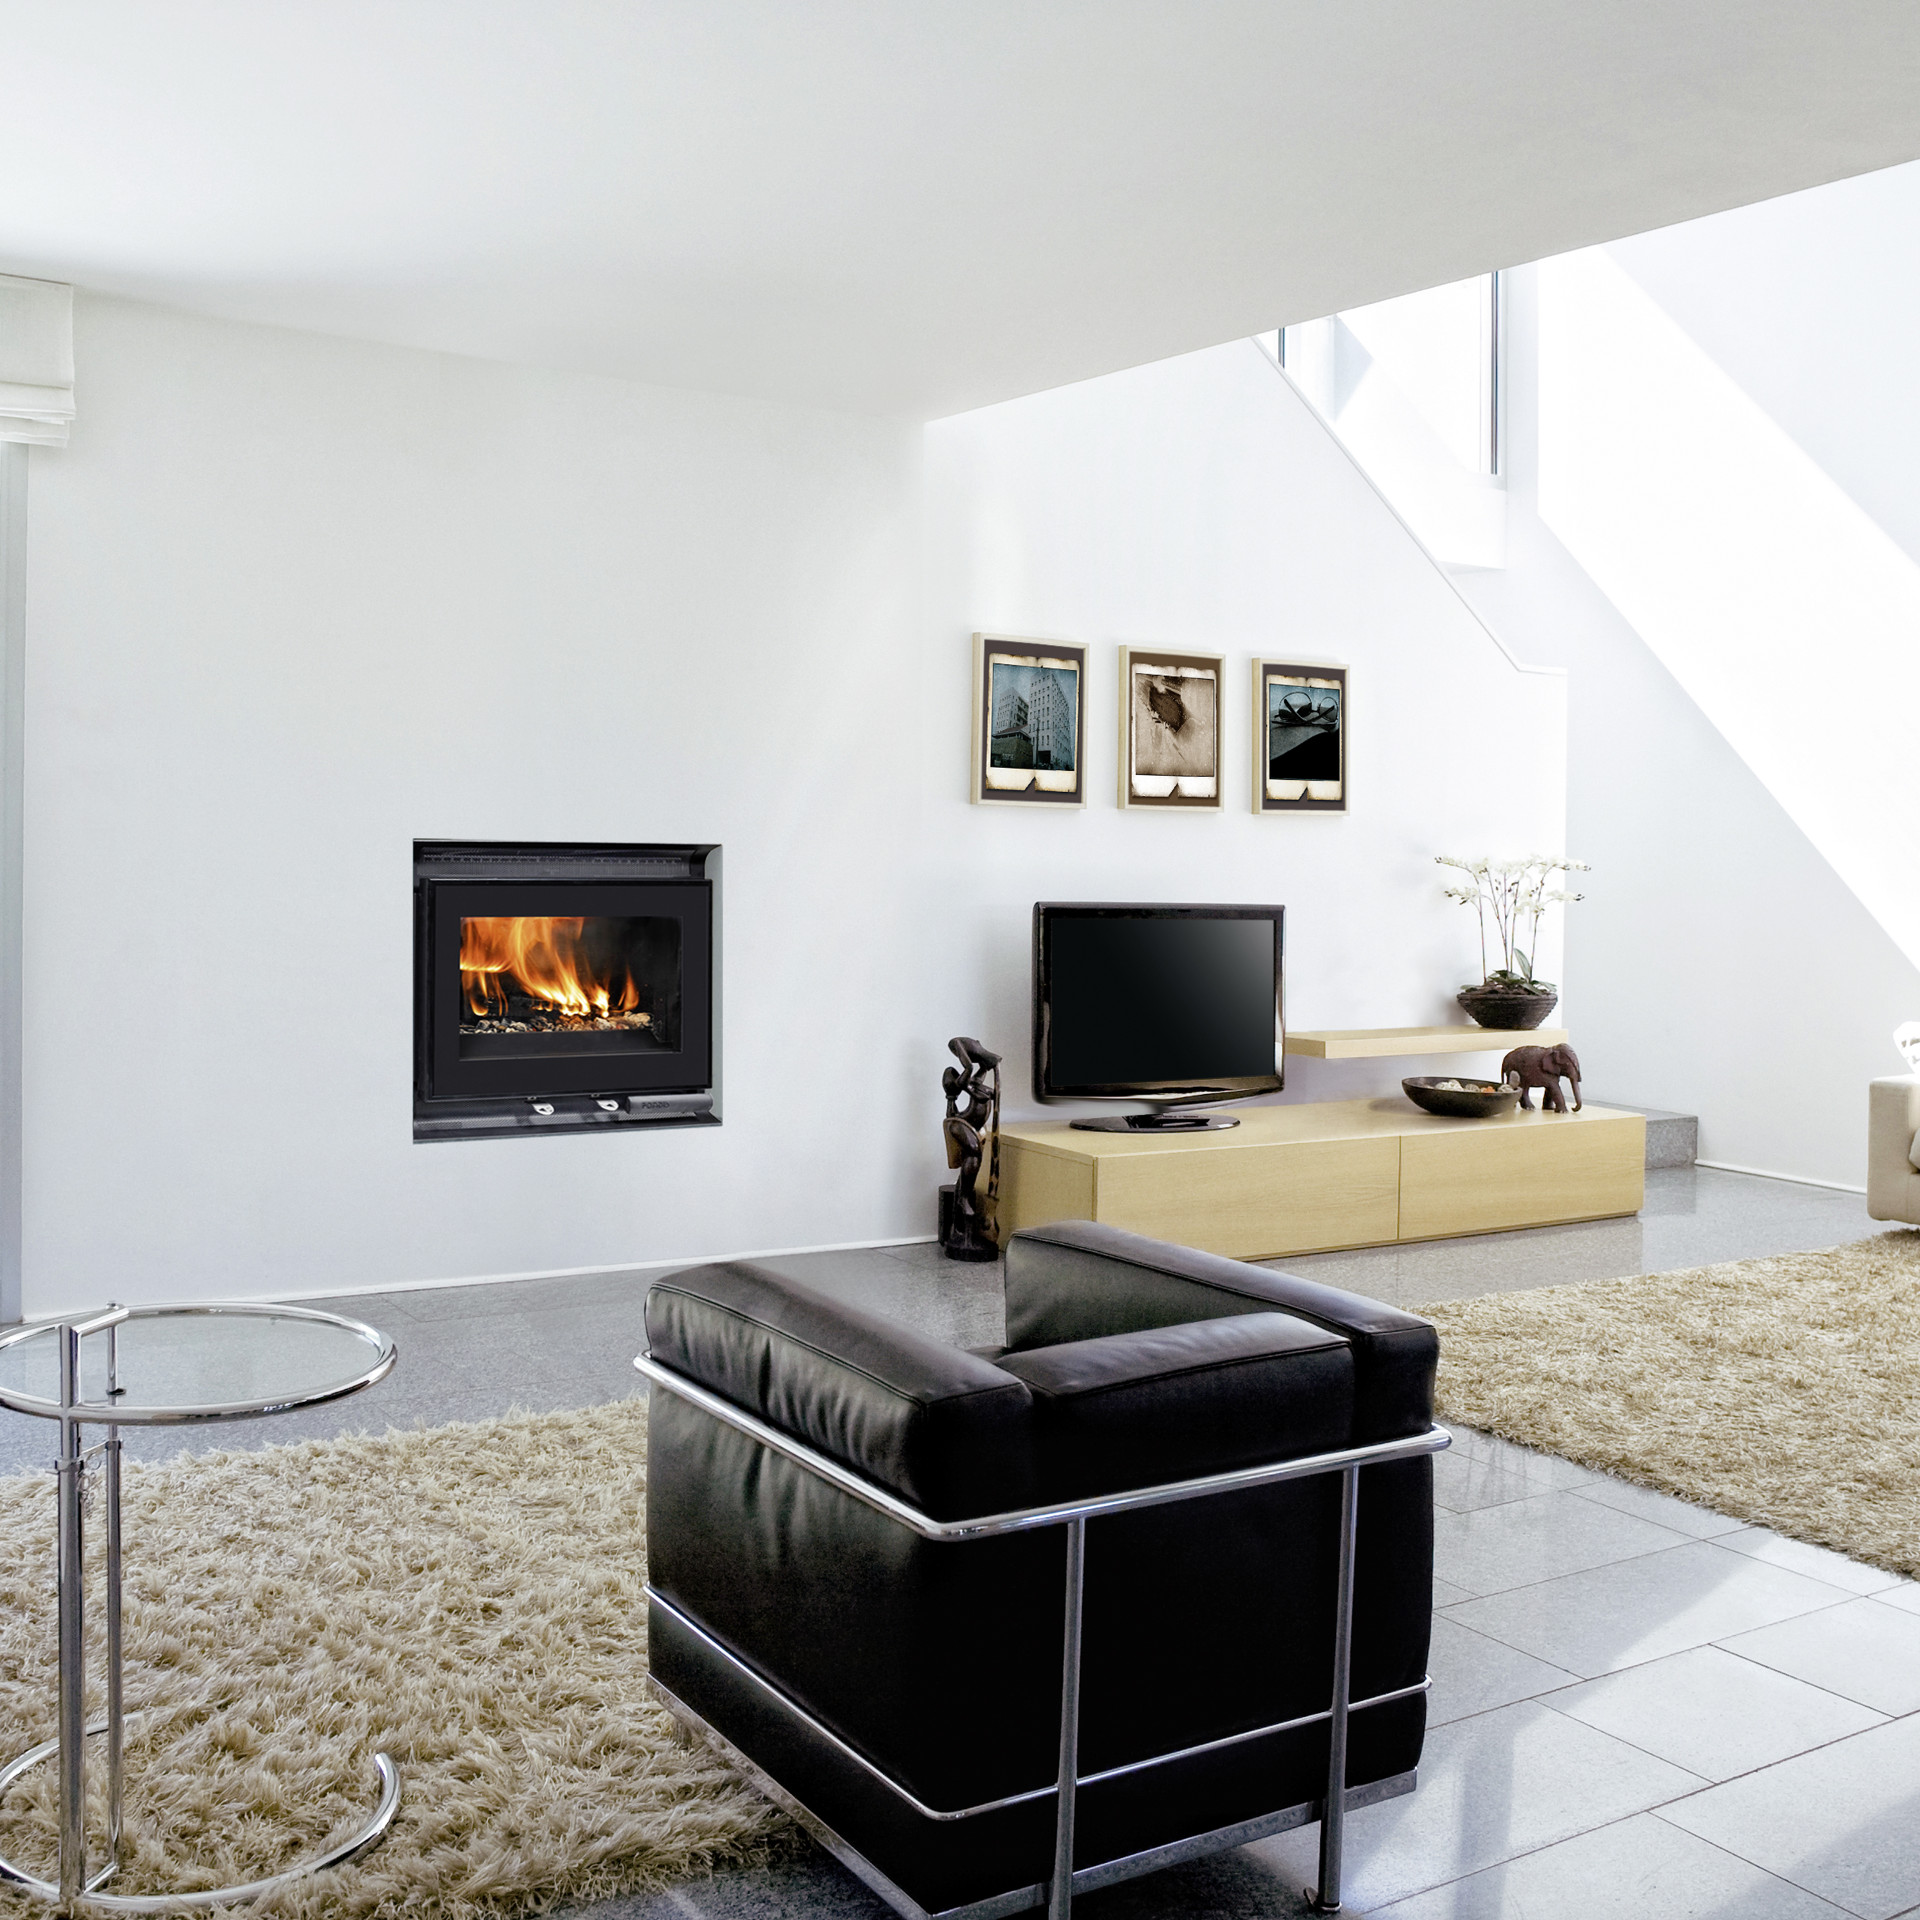 cheminee insert 2015. Black Bedroom Furniture Sets. Home Design Ideas